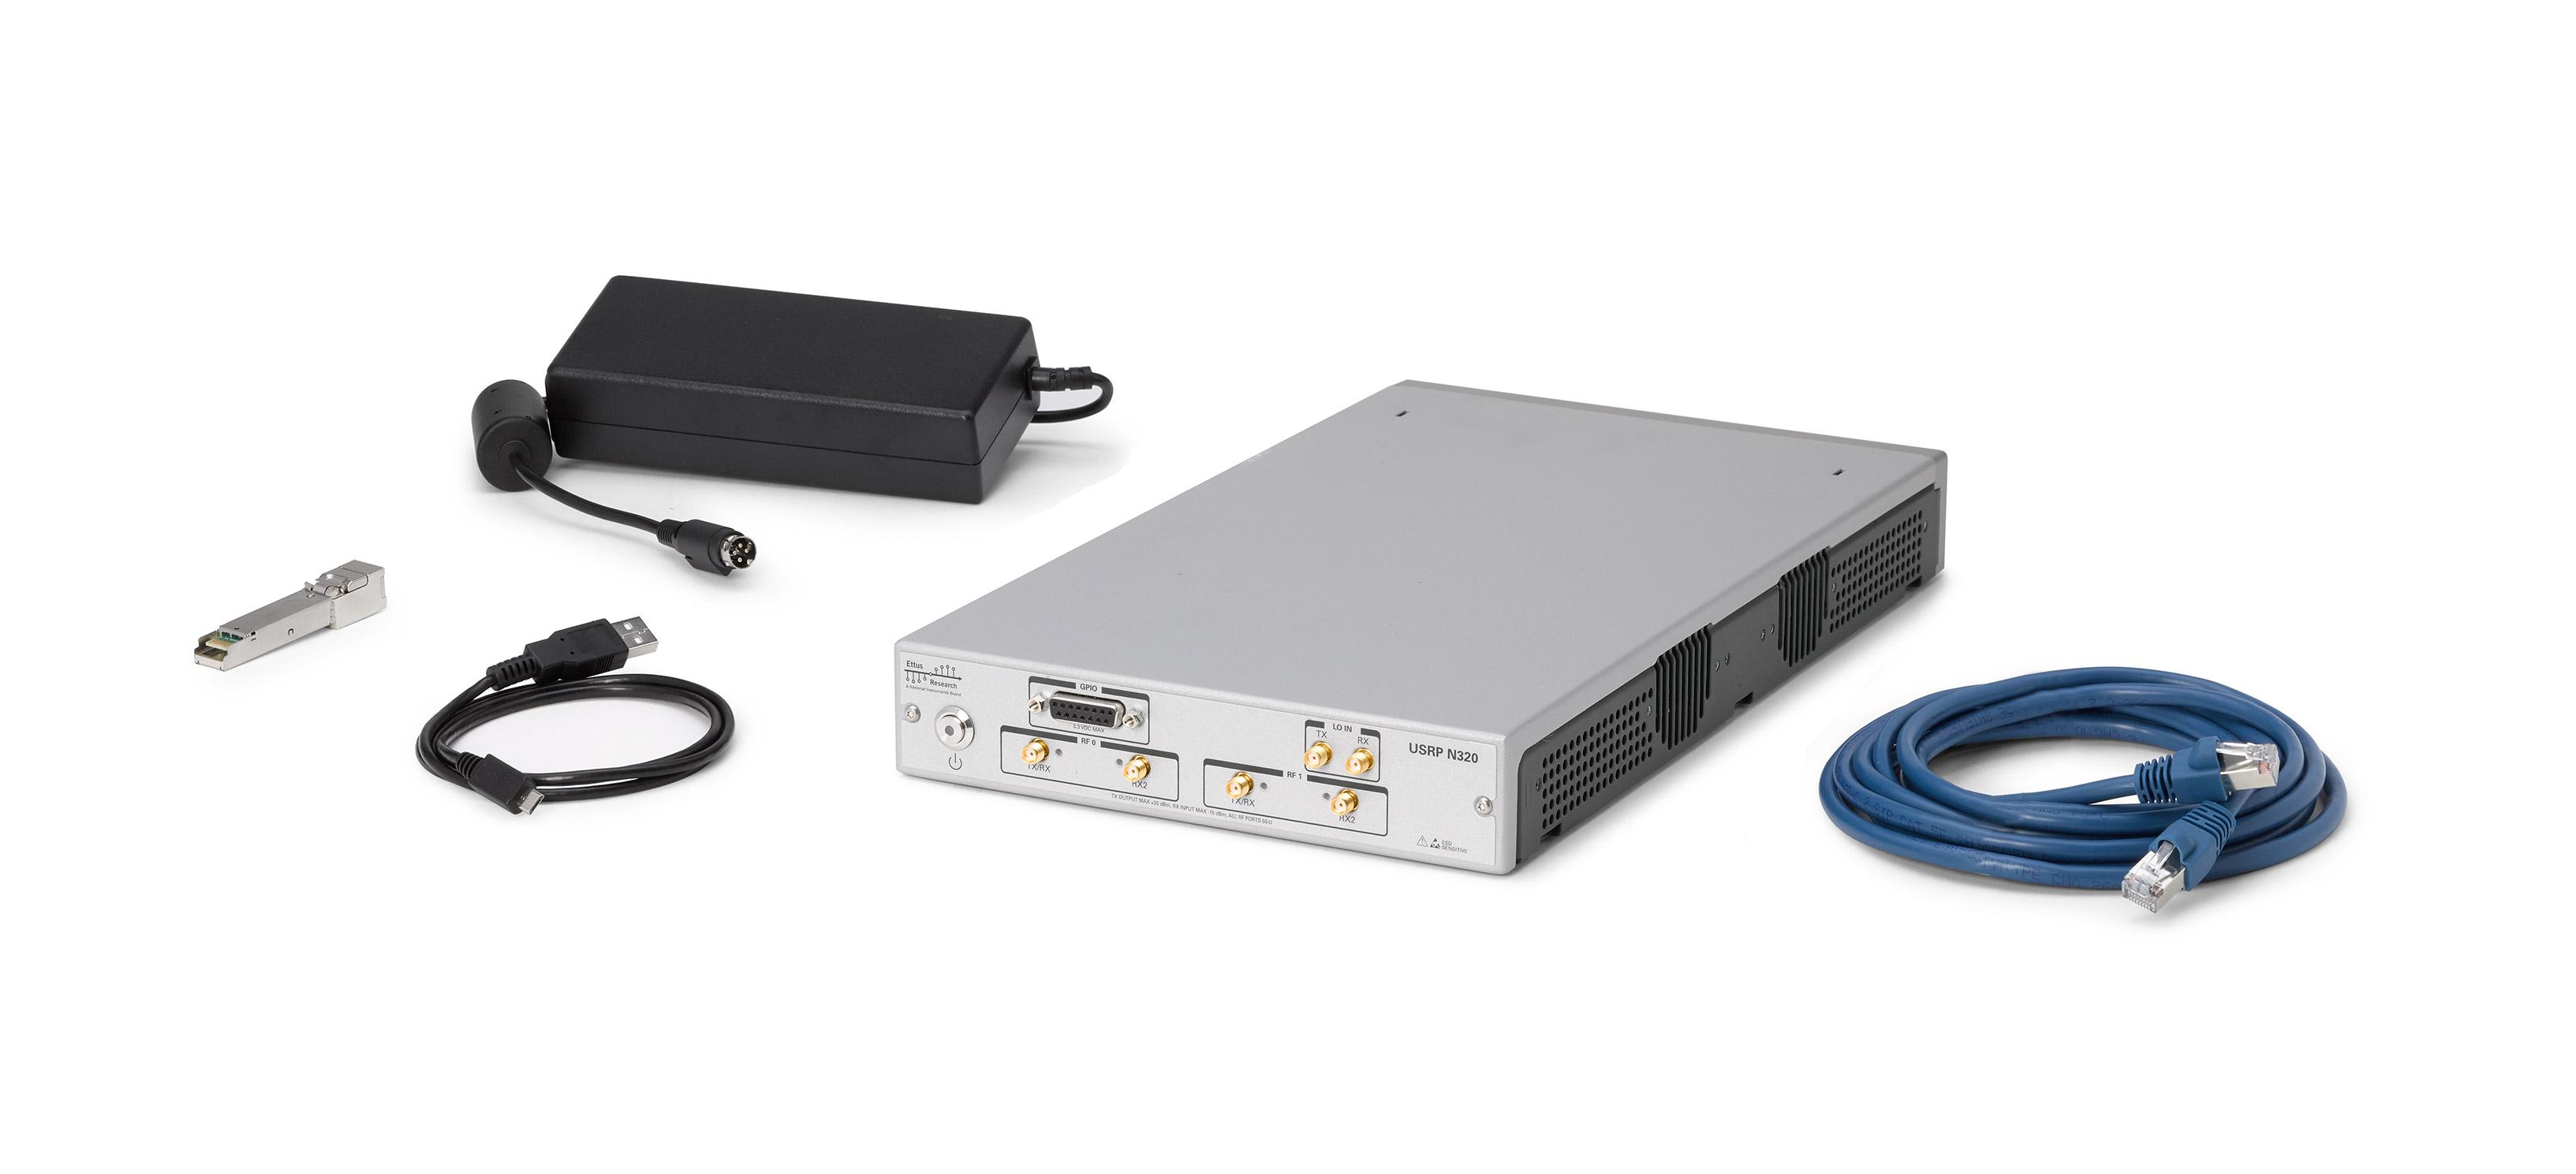 USRP N310 shipping kit